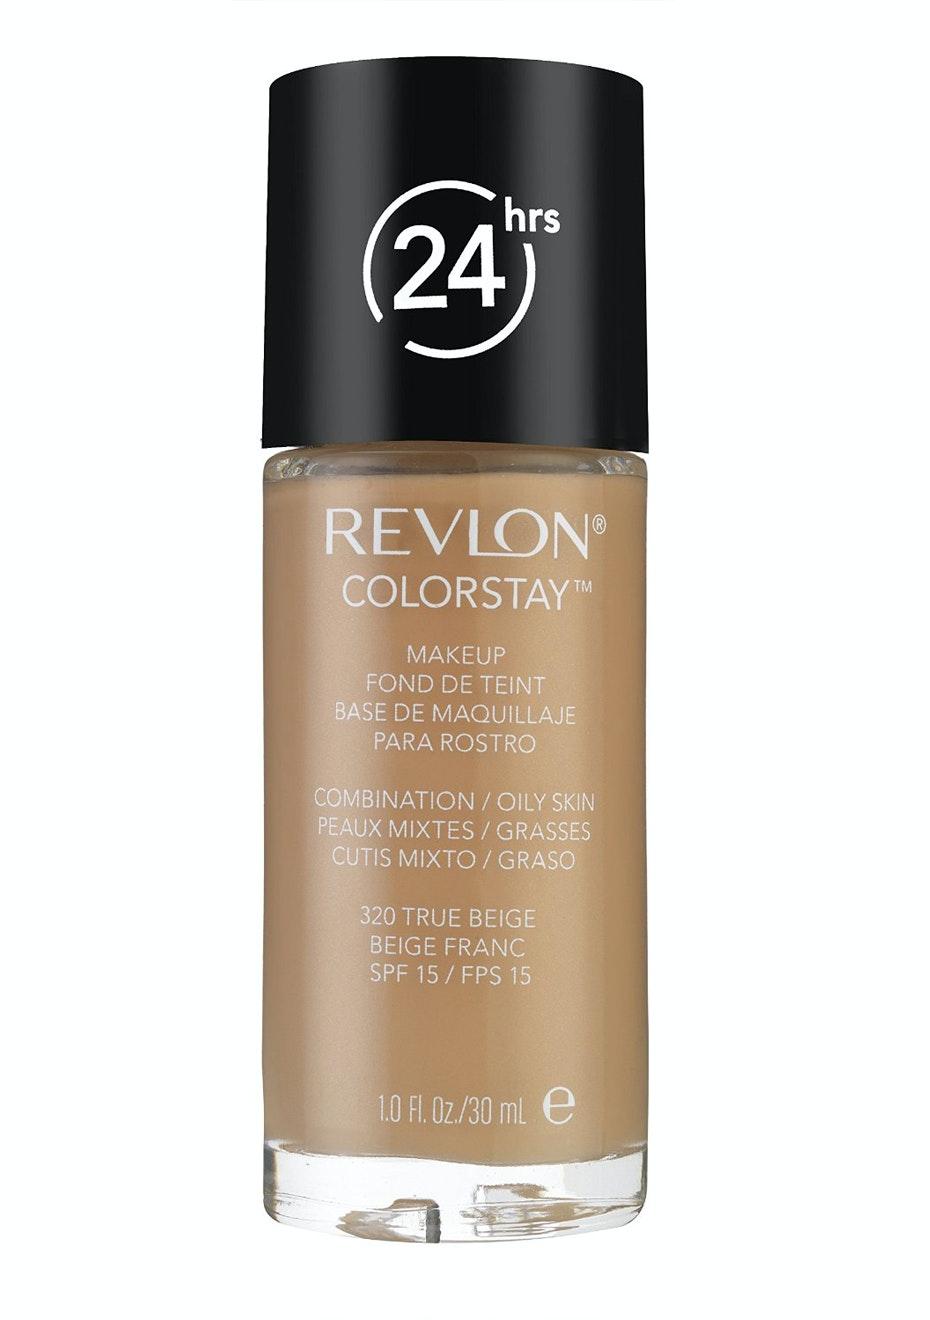 Revlon Colorstay 24hrs Liquid Makeup Combo/Oily 320 True Beige